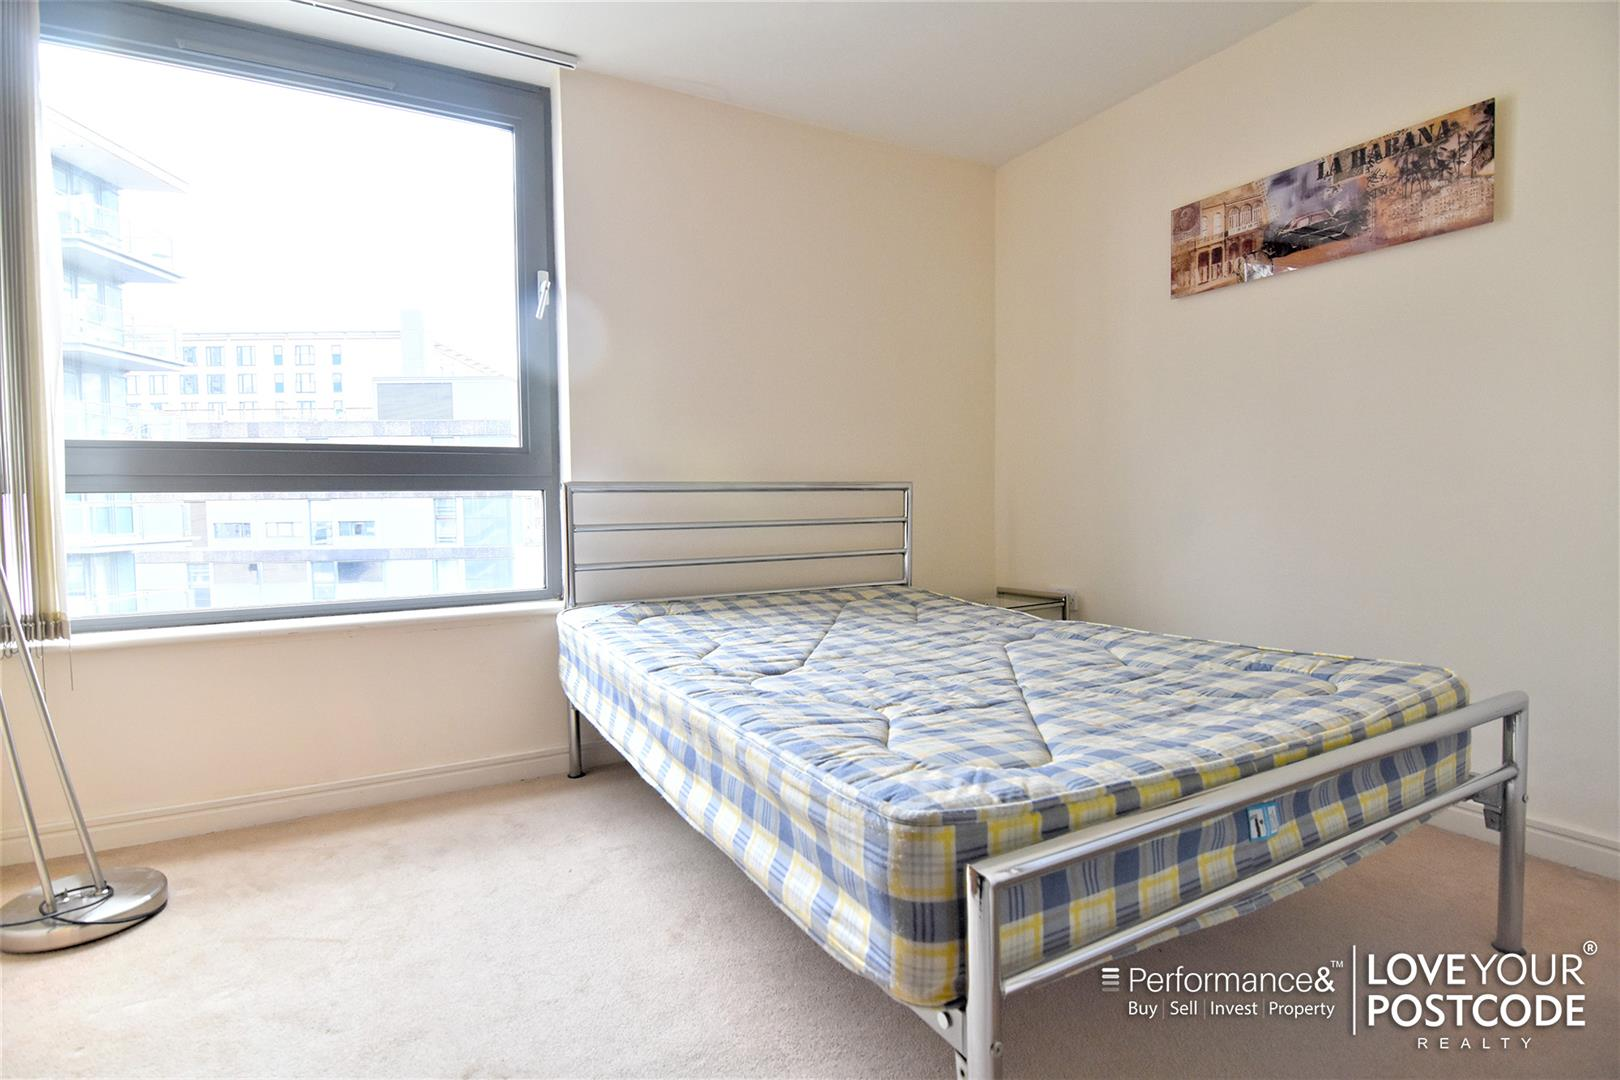 loveyourpostcode.com Holliday-Street-Birmingham-30726460